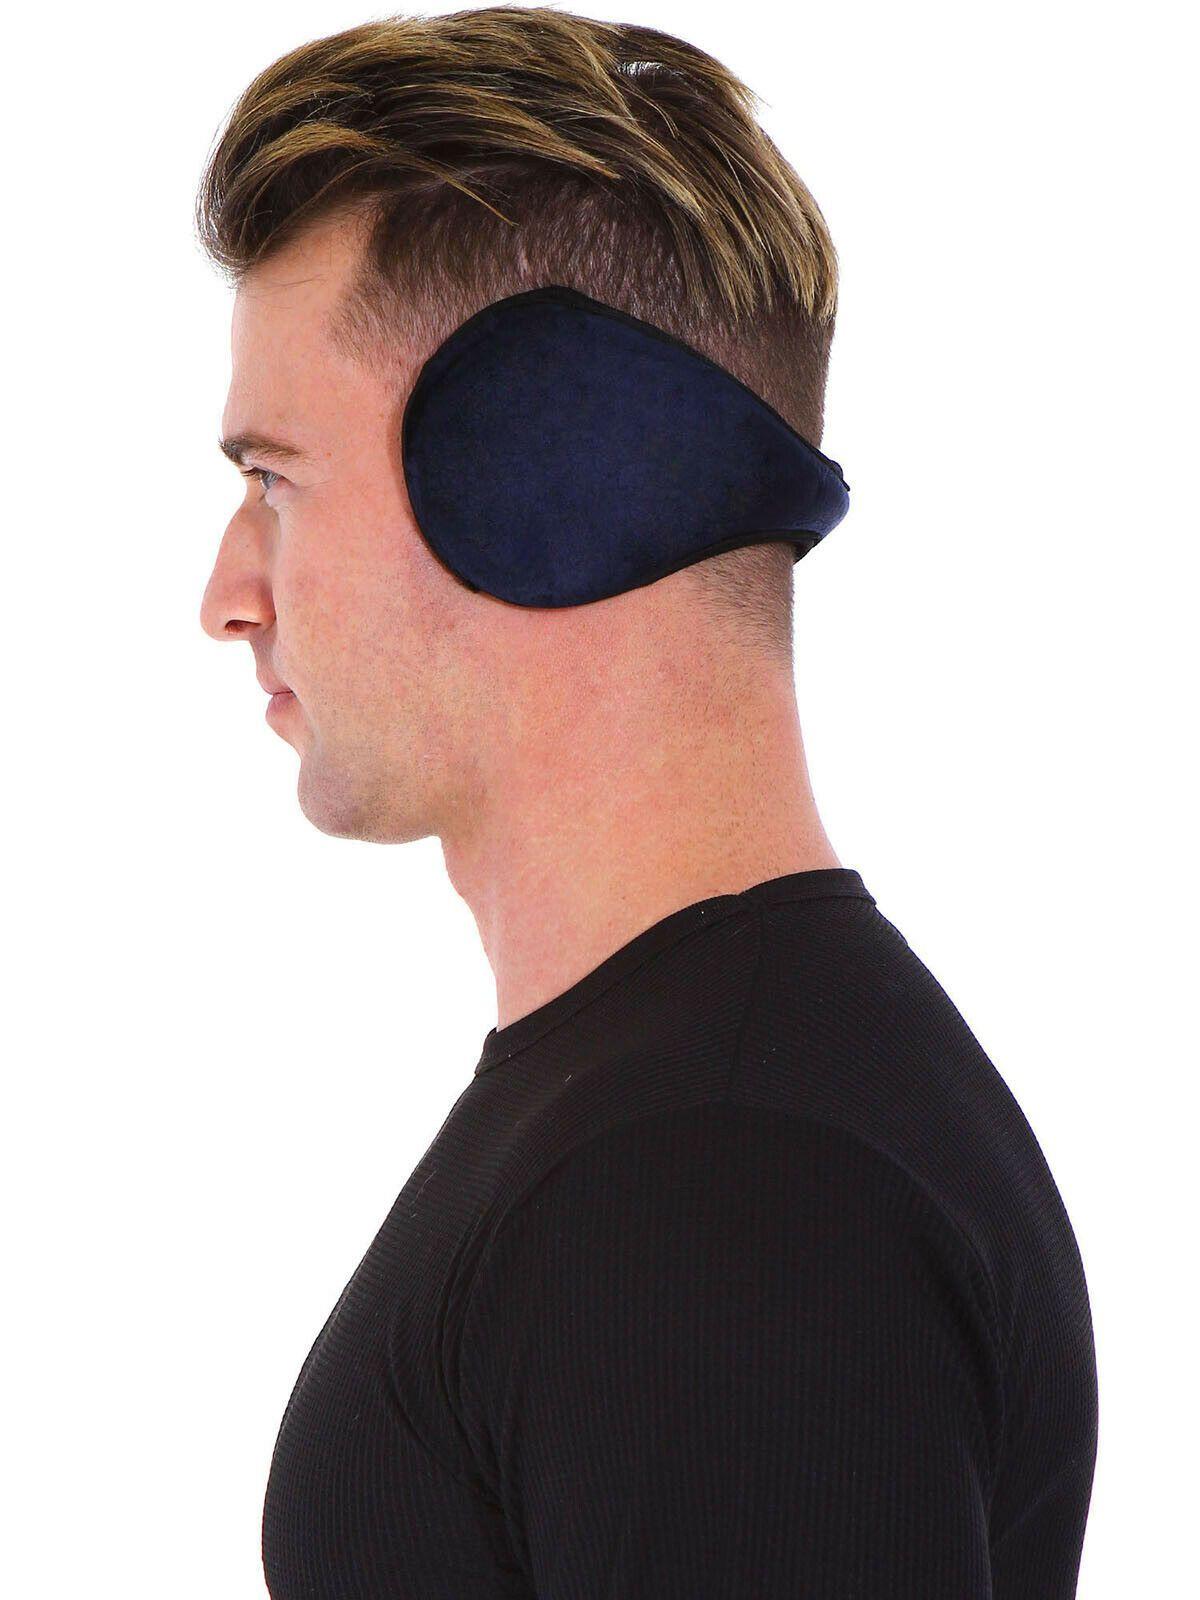 Mens Winter Ear Muffs Fleece Earwarmer Ear warmers Behind the Head Design - Ear  Muffs #earmuffs #earmuff - Mens Win…   Ear warmers, Earmuffs, Electronic ear  muffs